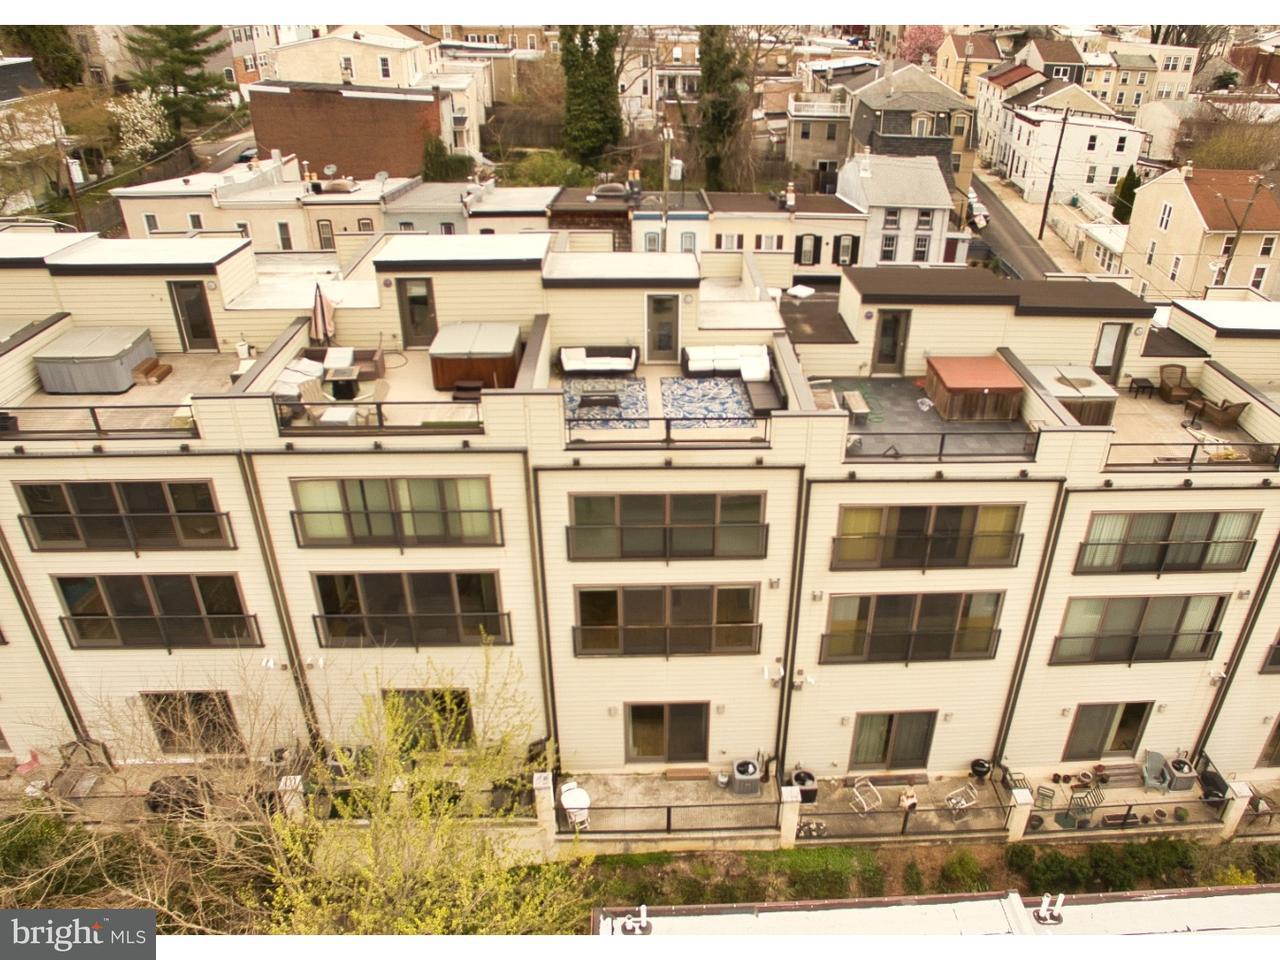 4344 Terrace St Philadelphia PA 19128